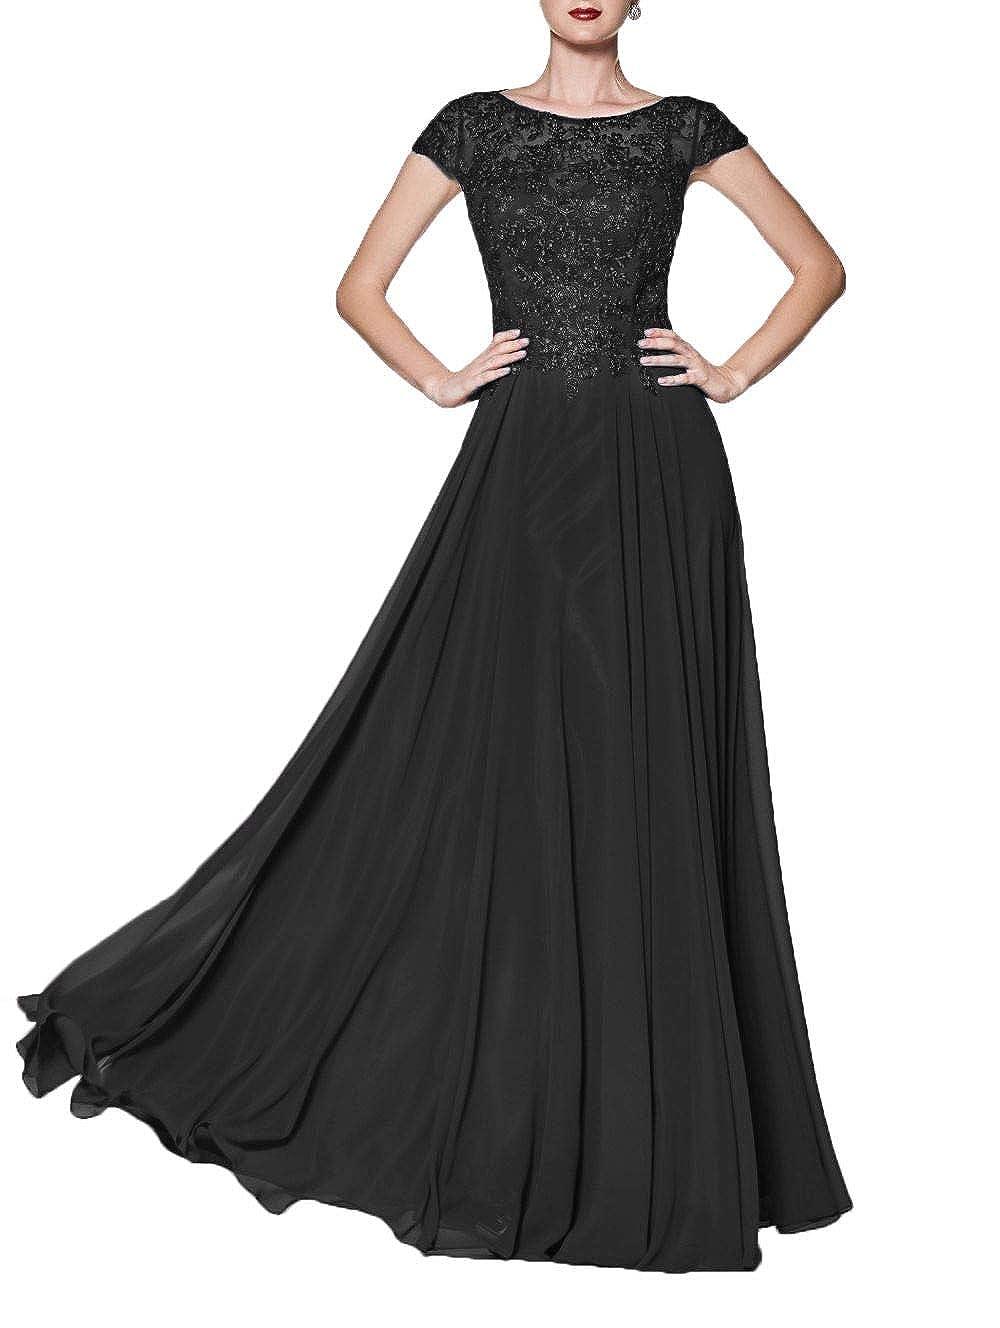 Black Wanshaqin Women's Illusion Neckline Jeweled Waist Long Evening Gown Prom Formal Dress Bridesmaid Gown